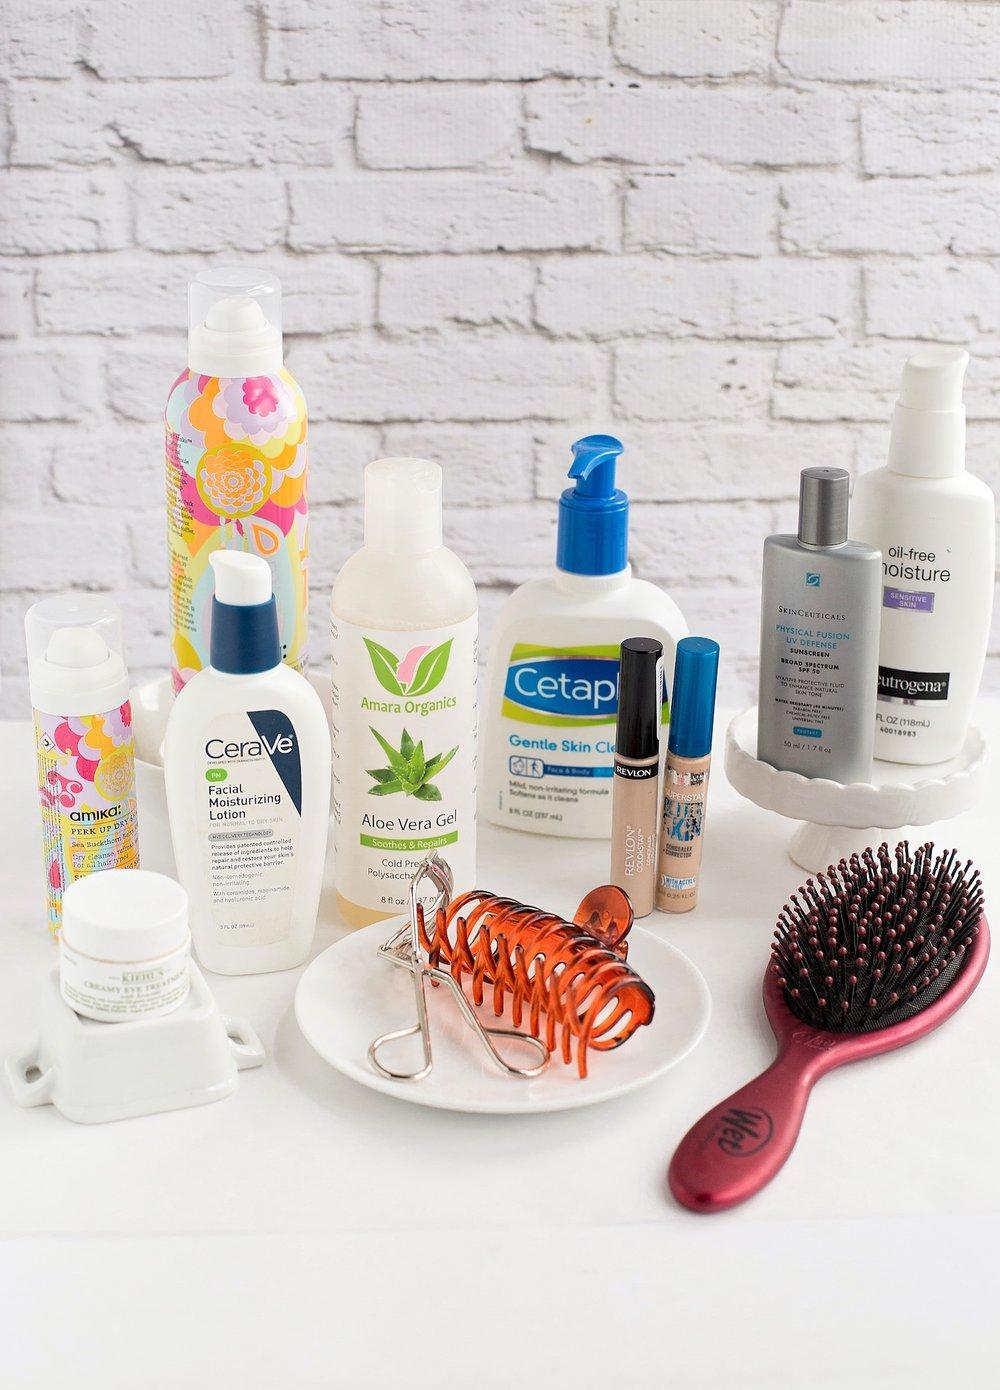 New Beauty Products I'm Loving | TrufflesandTrends.com